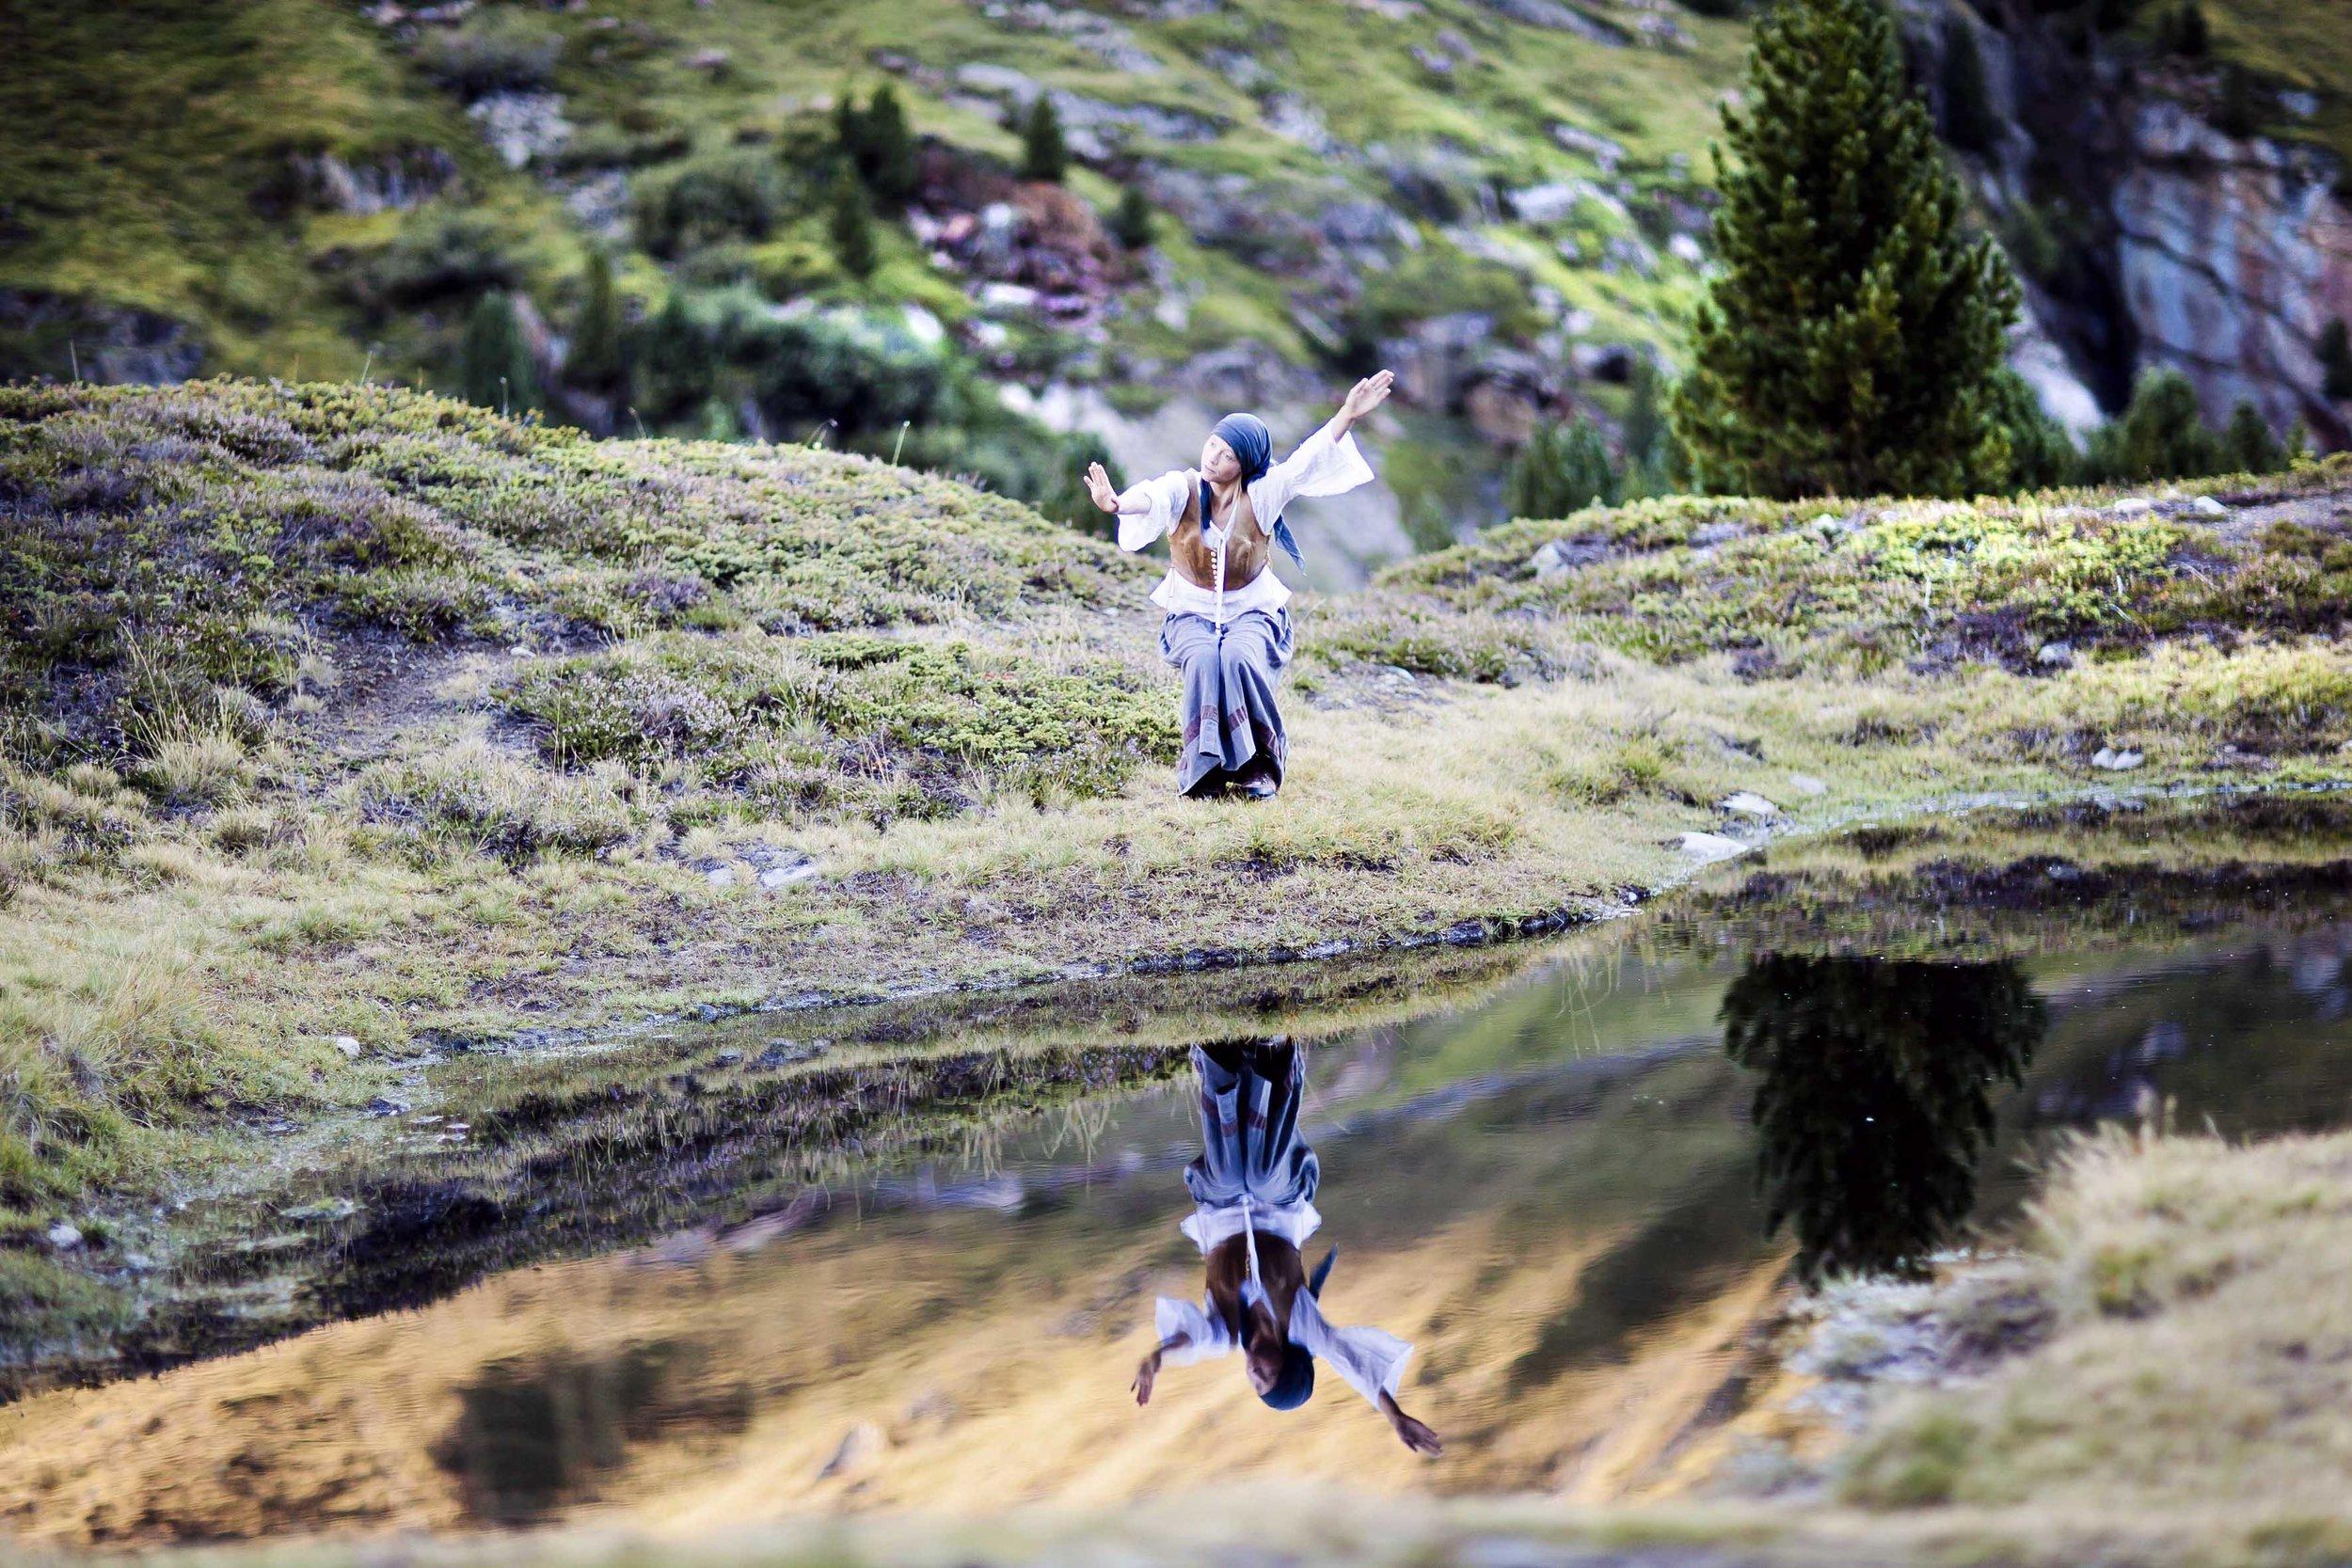 Magd tanzt am Gebirgssee, 2012 © Ernst Lorenzi